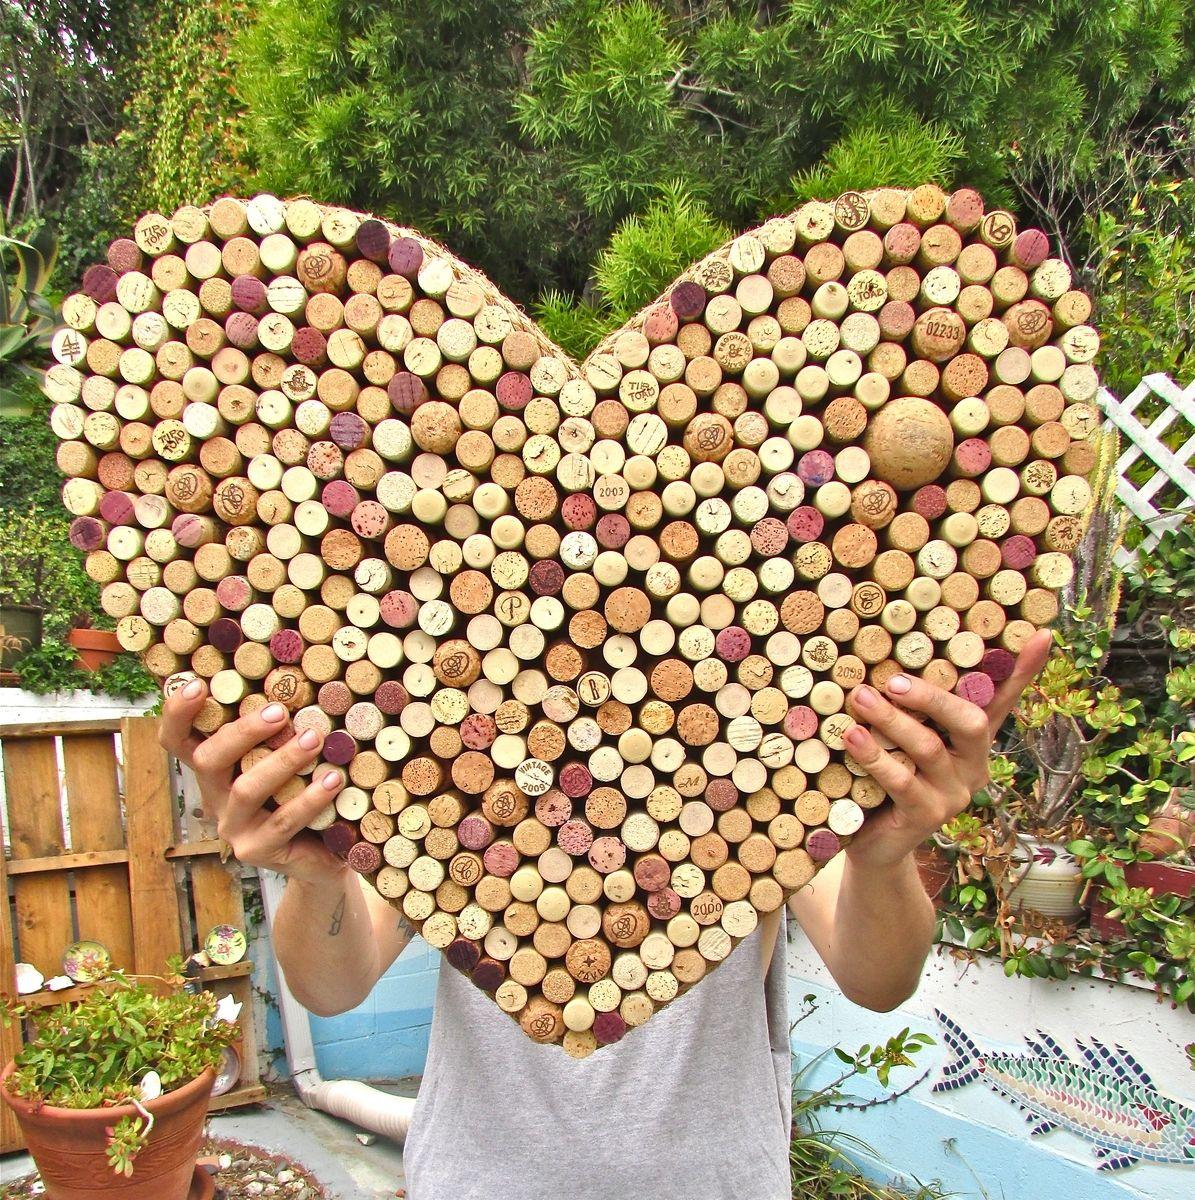 Custom Heart Shaped CorkPin Boards Using Recycled Wine